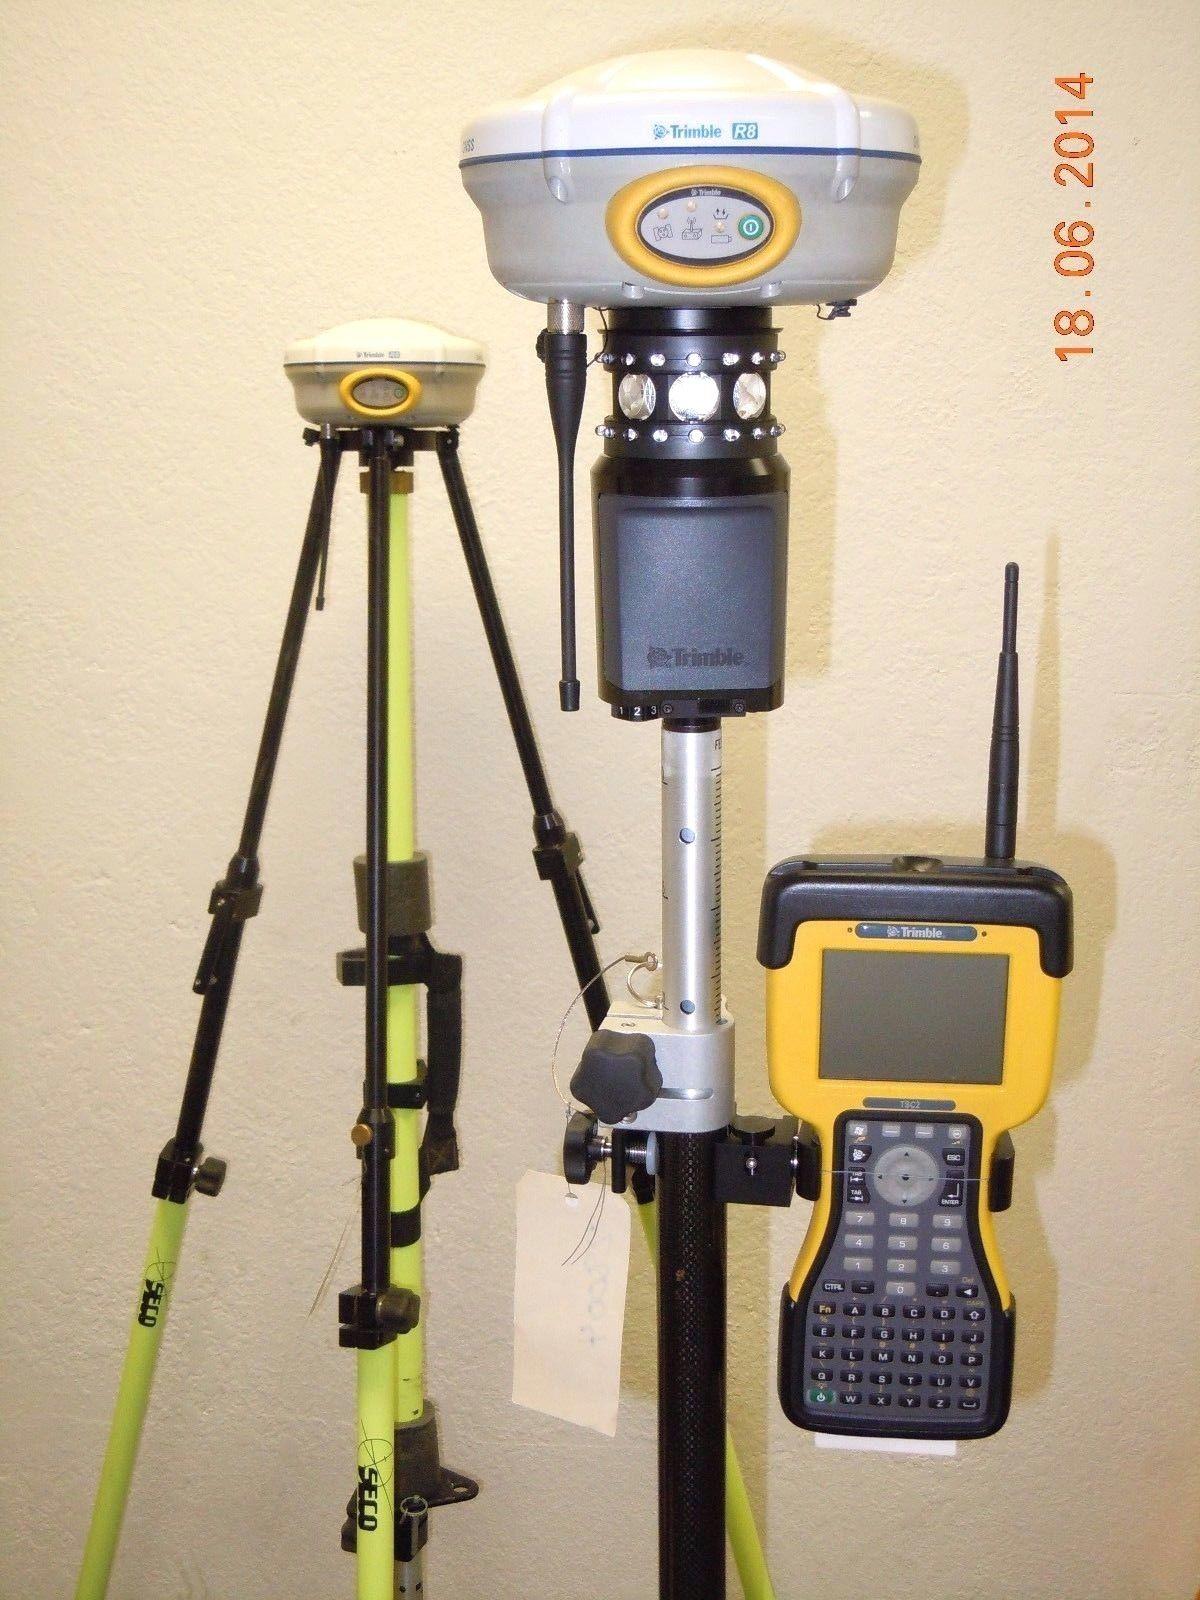 trimble s6 robotic total station manual